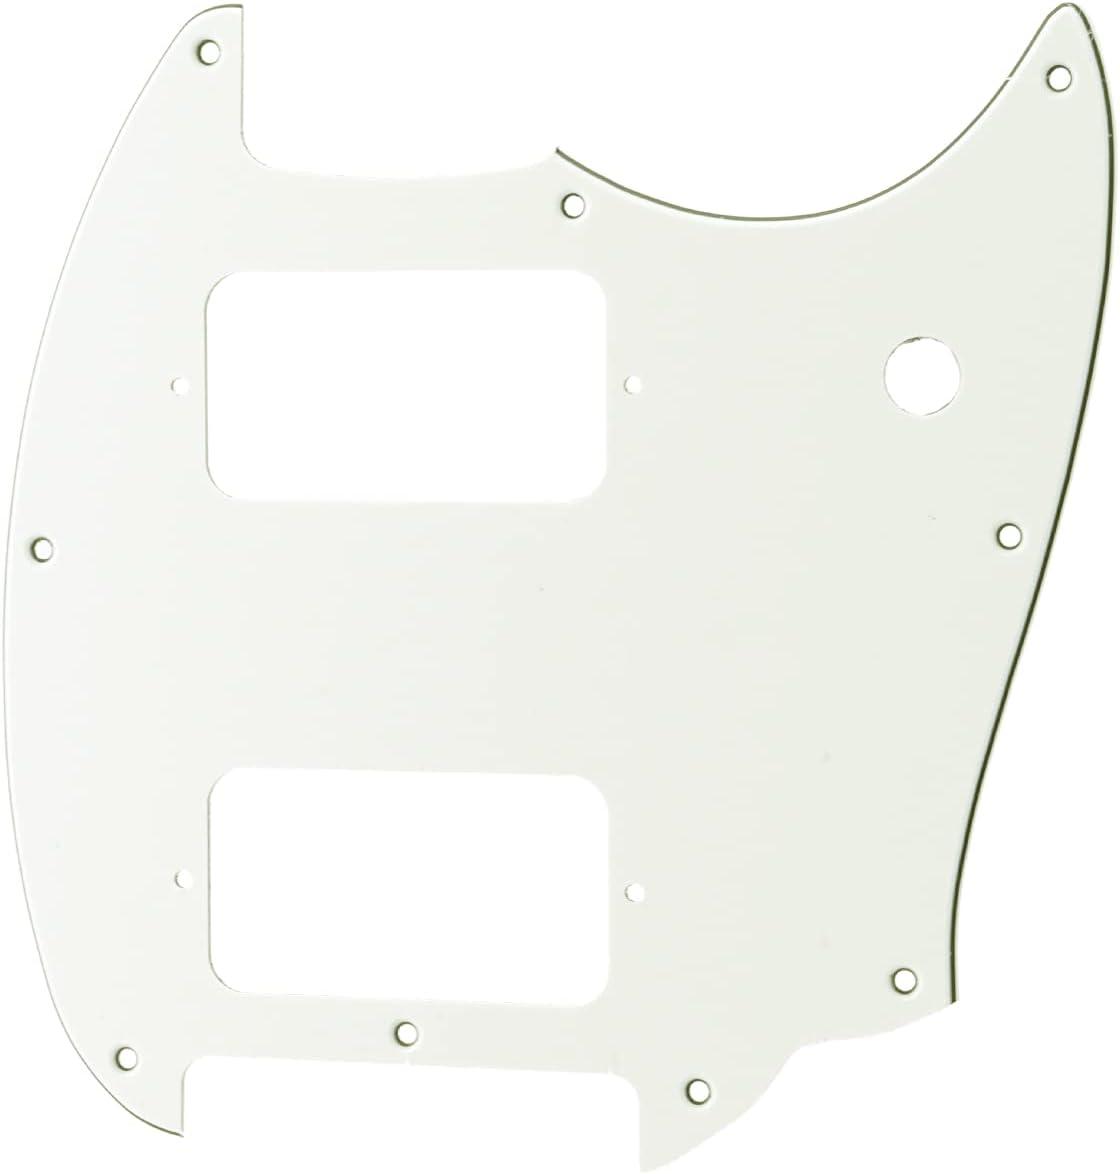 Musiclily Pro 9 Agujero Round Corner HSH Golpeador Pickguard para Guitarra Eléctrica Squier Bullet Series Mustang, 3 capas Blanco